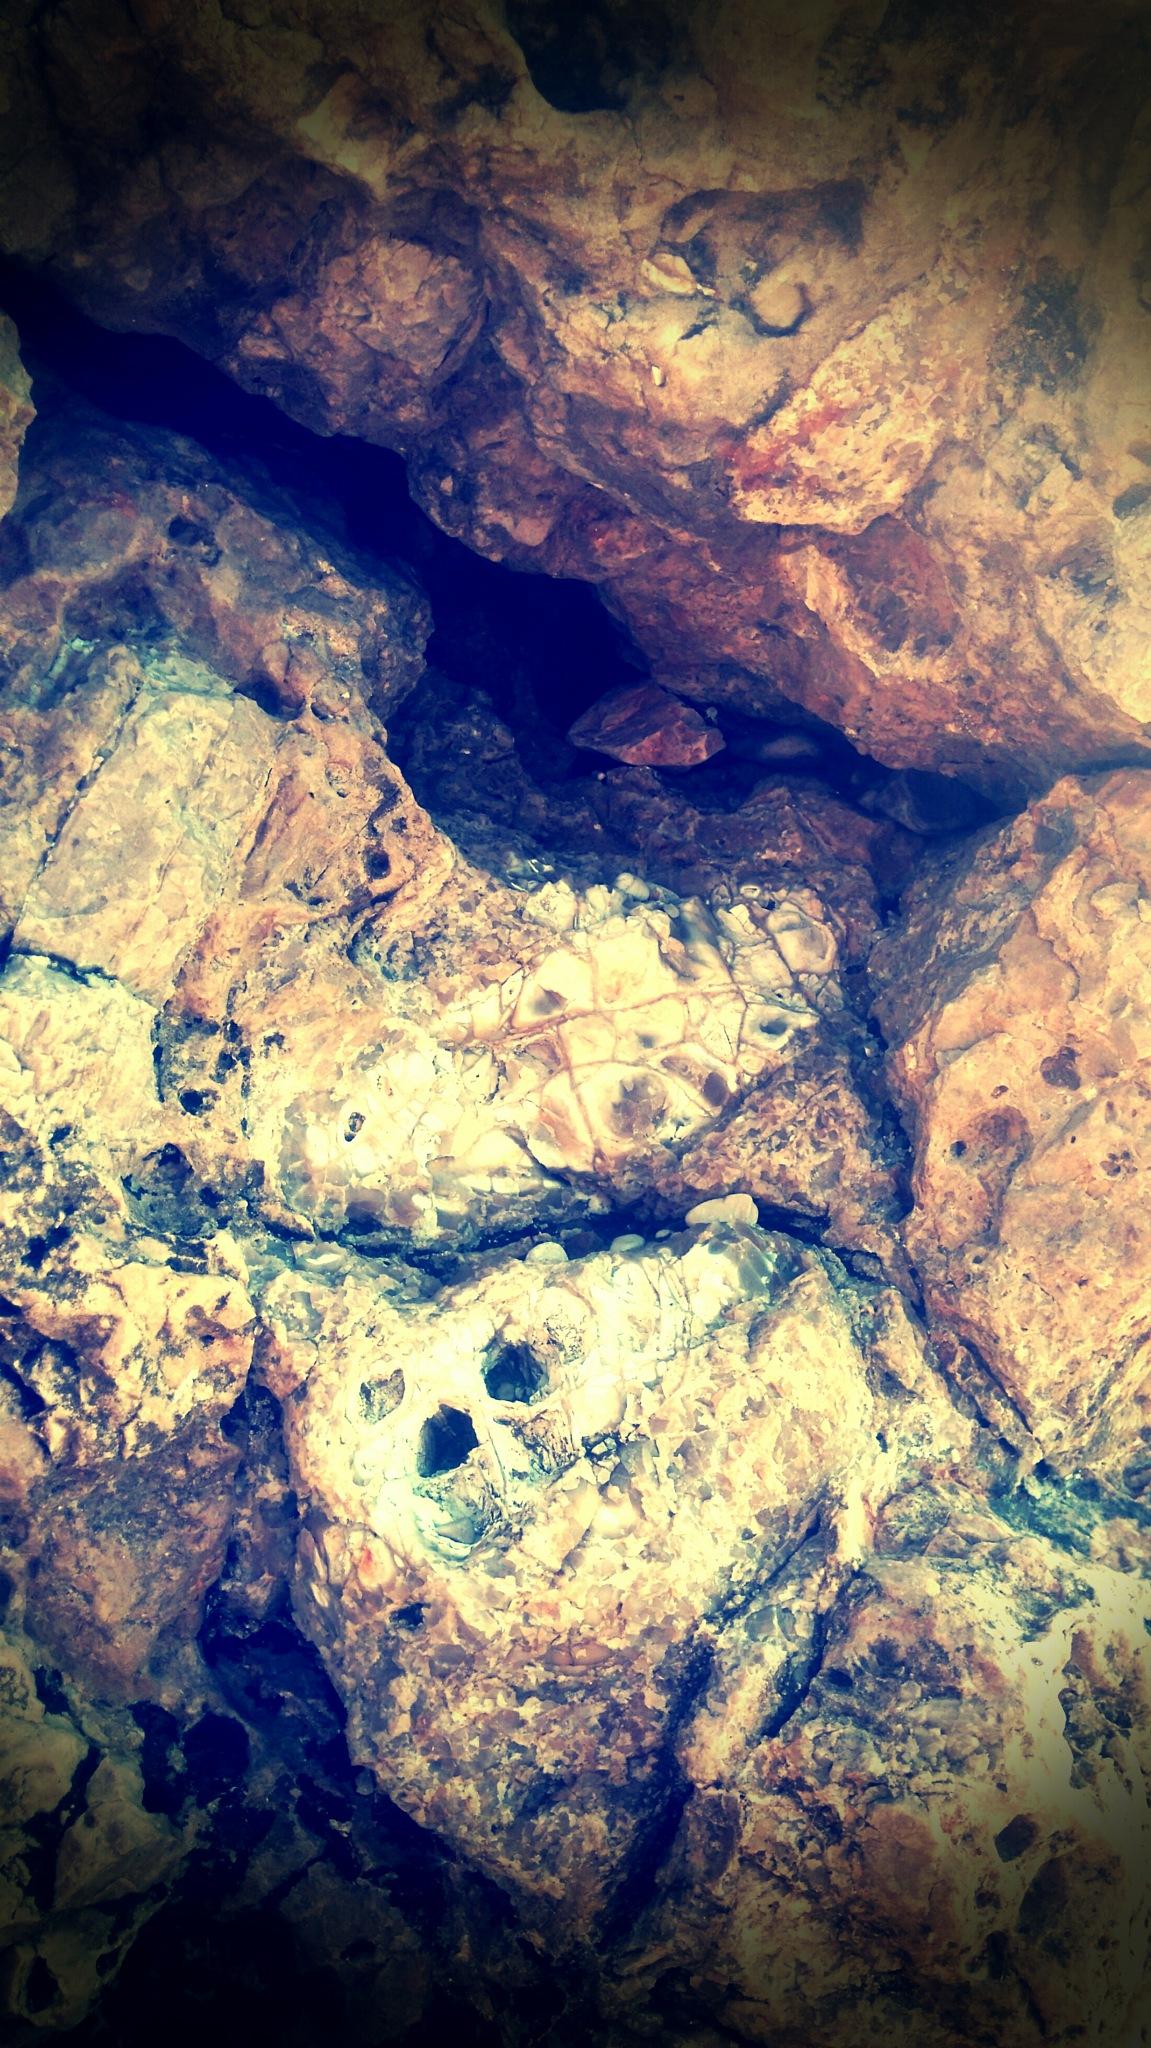 The rock anatomy  by Natasha Mitreska